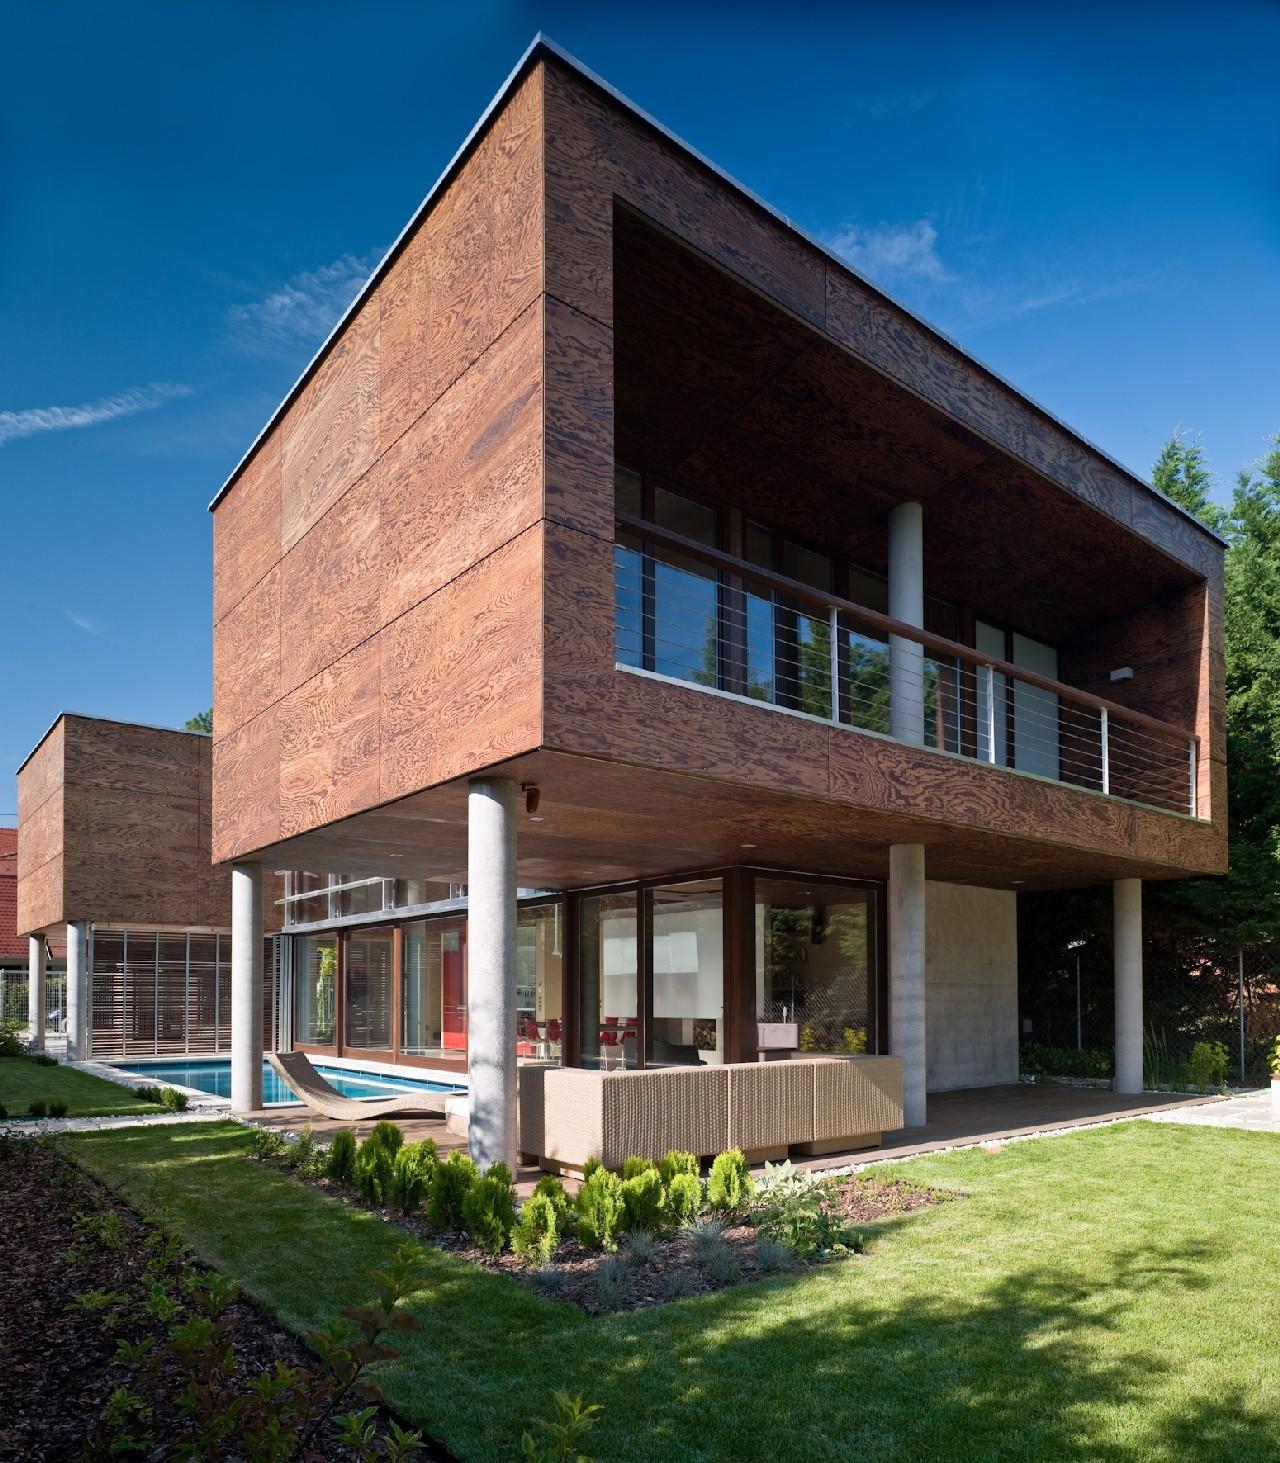 Summer Villa at Lake Balaton / FBI Studio architects, © Zsolt Batár